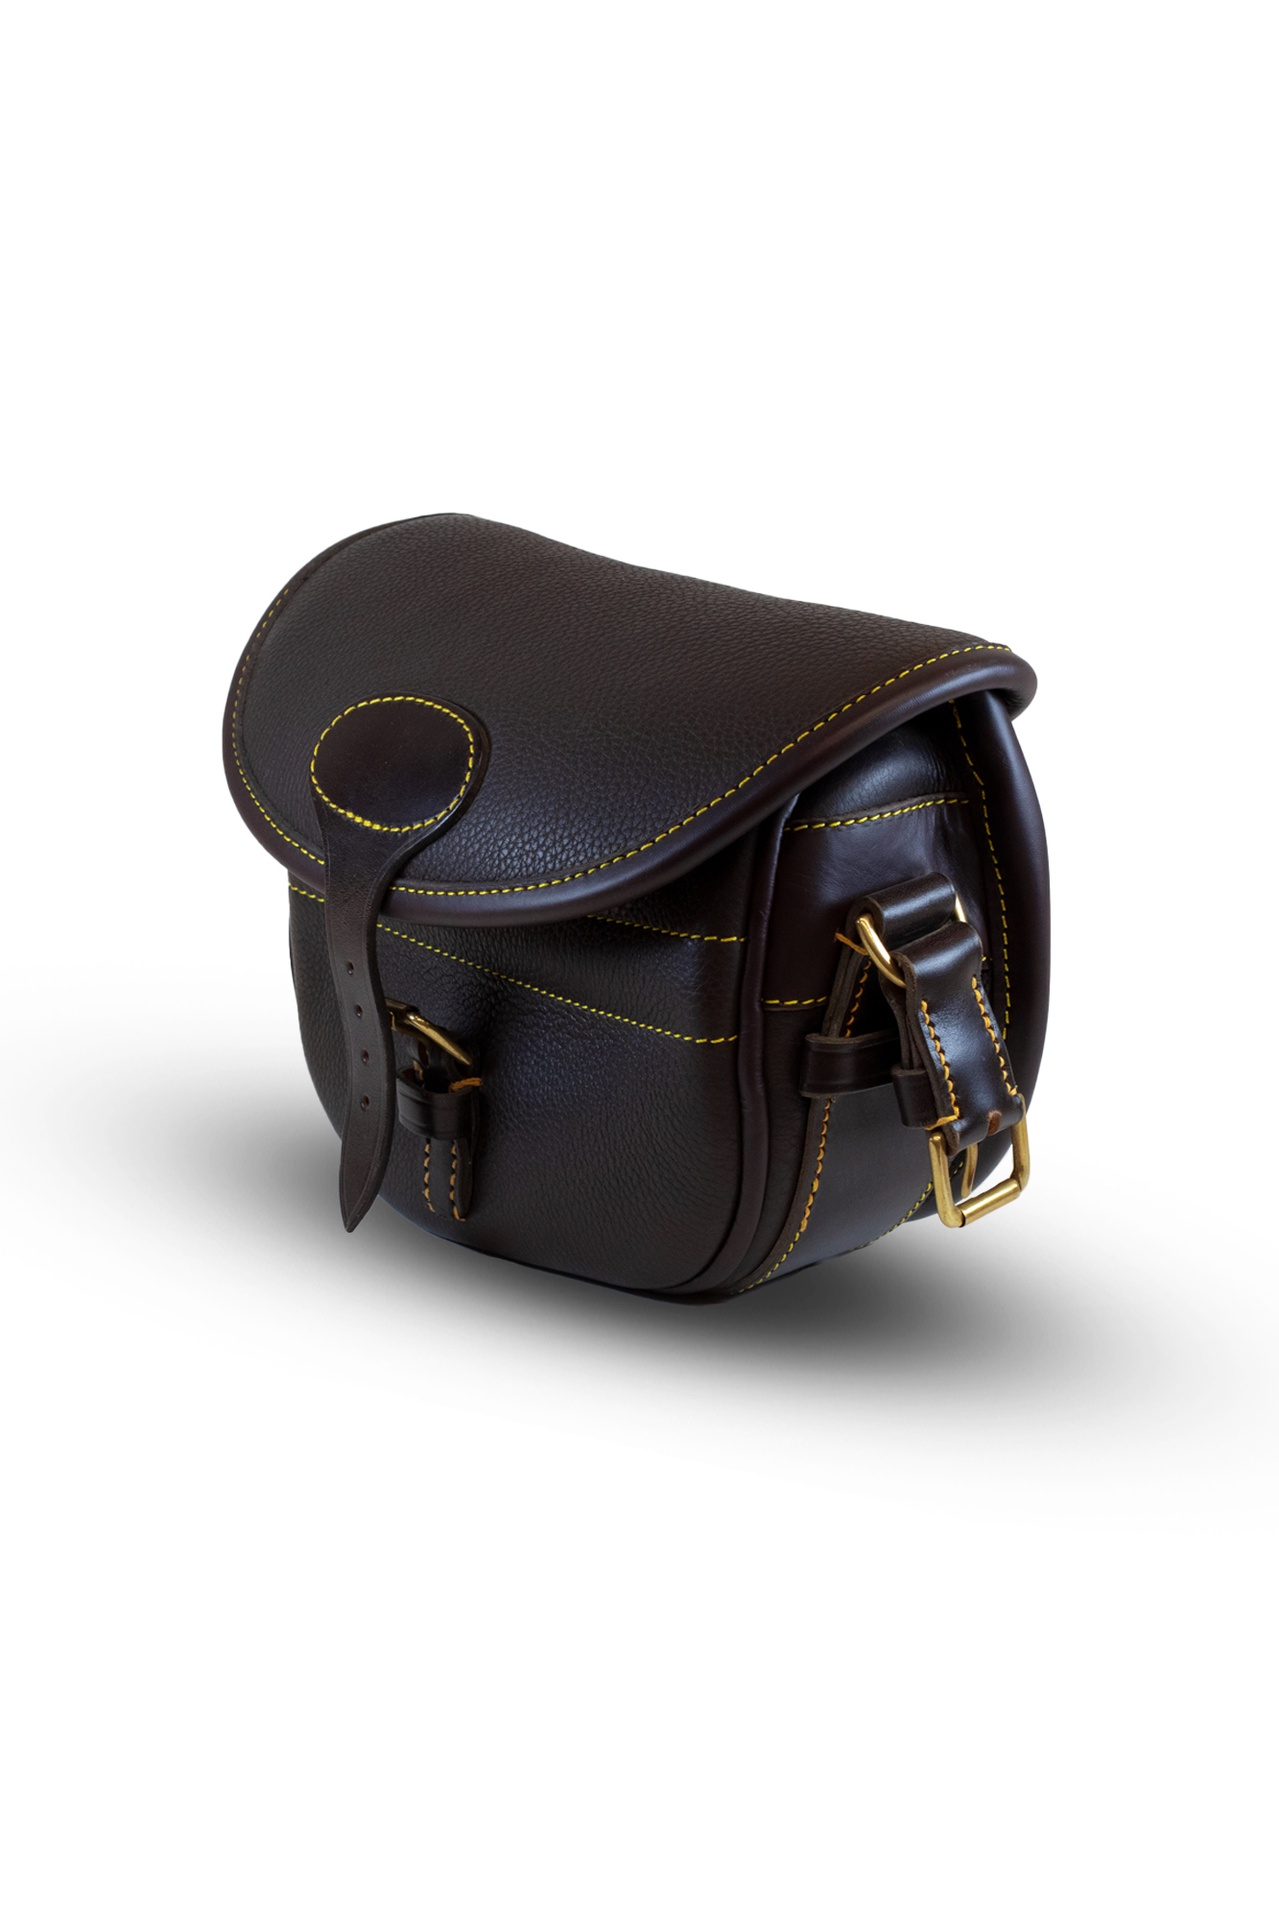 Best Leather Cartridge Bag (100) – Dark Brown Textured